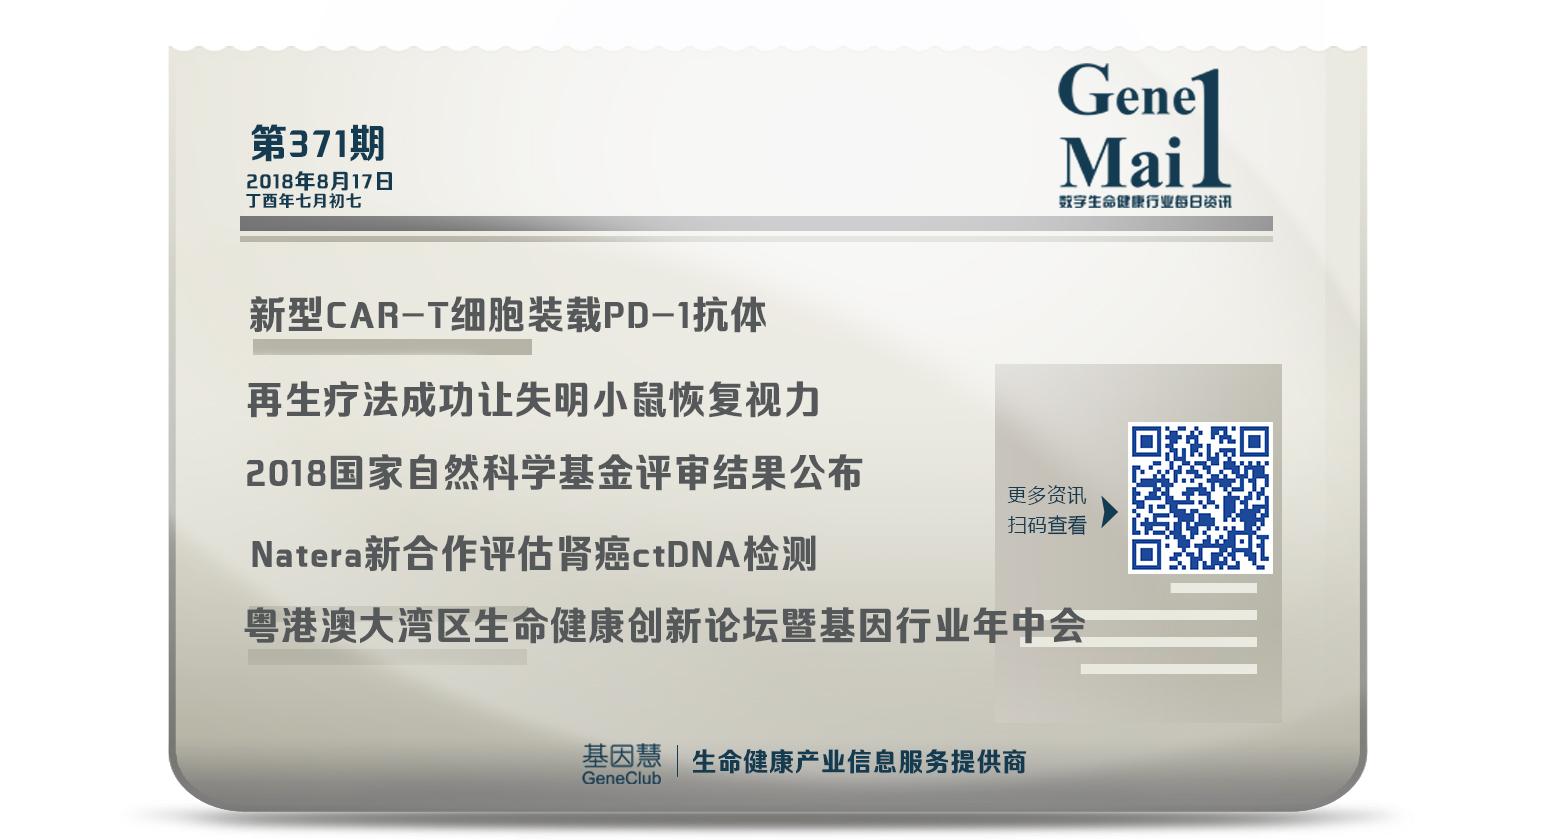 GeneMail | 新型CAR-T细胞装载PD-1抗体,有效对抗实体瘤